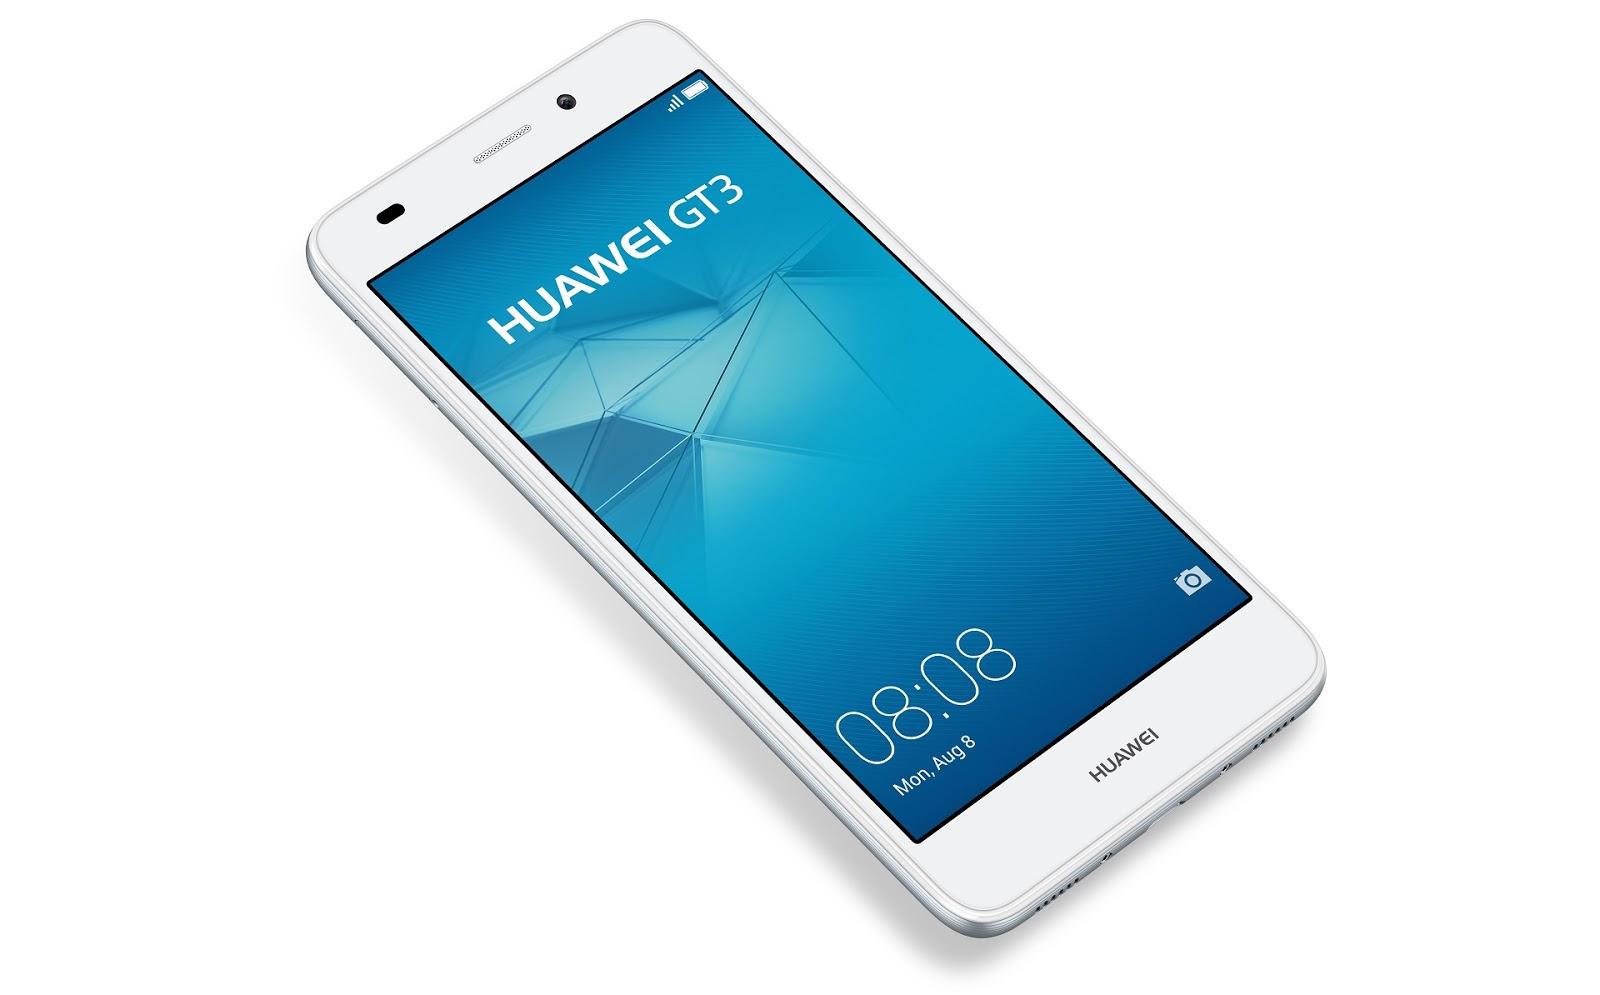 Quale memoria per Huawei GT3 e massima capacità, offerte Micro SD prezzi bassi da 5 euro